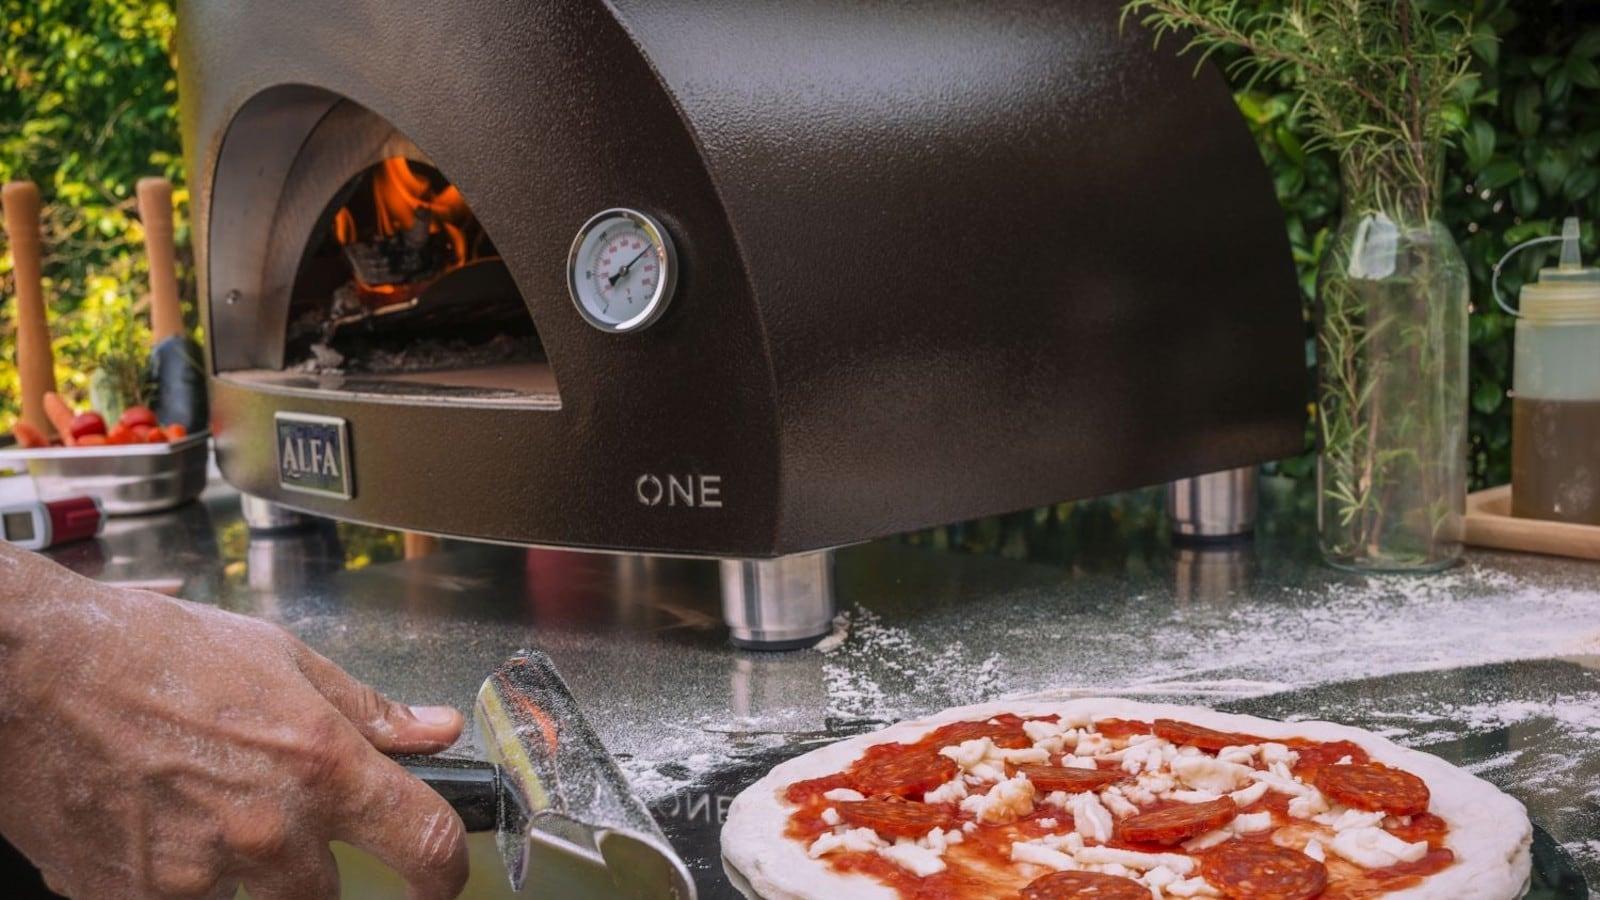 ALFA One Compact Pizza Oven